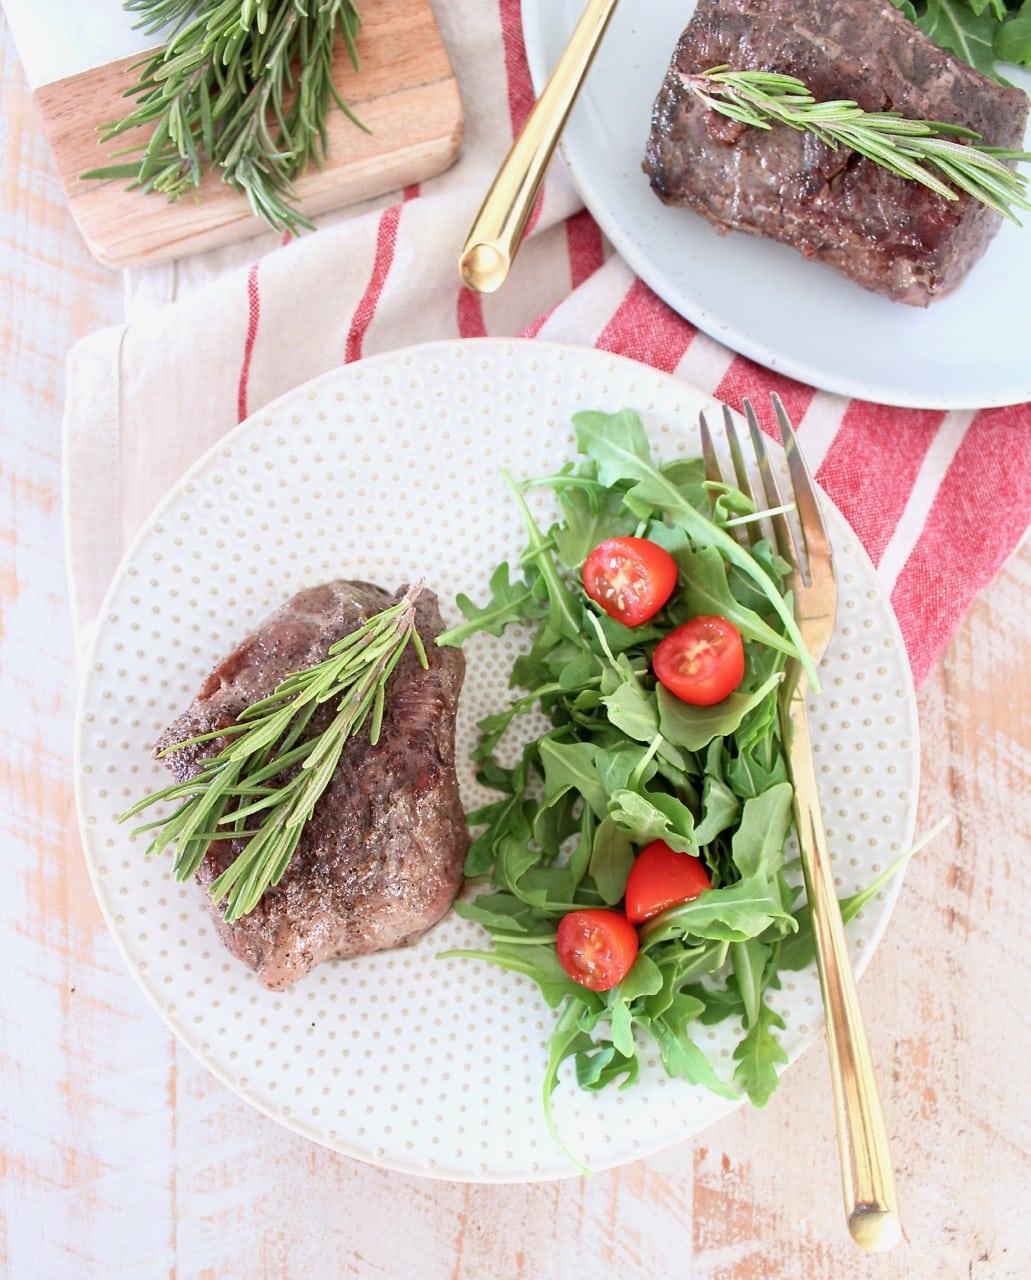 Rosemary Garlic Sous Vide Steak Recipe with Arugula Tomato Side Salad